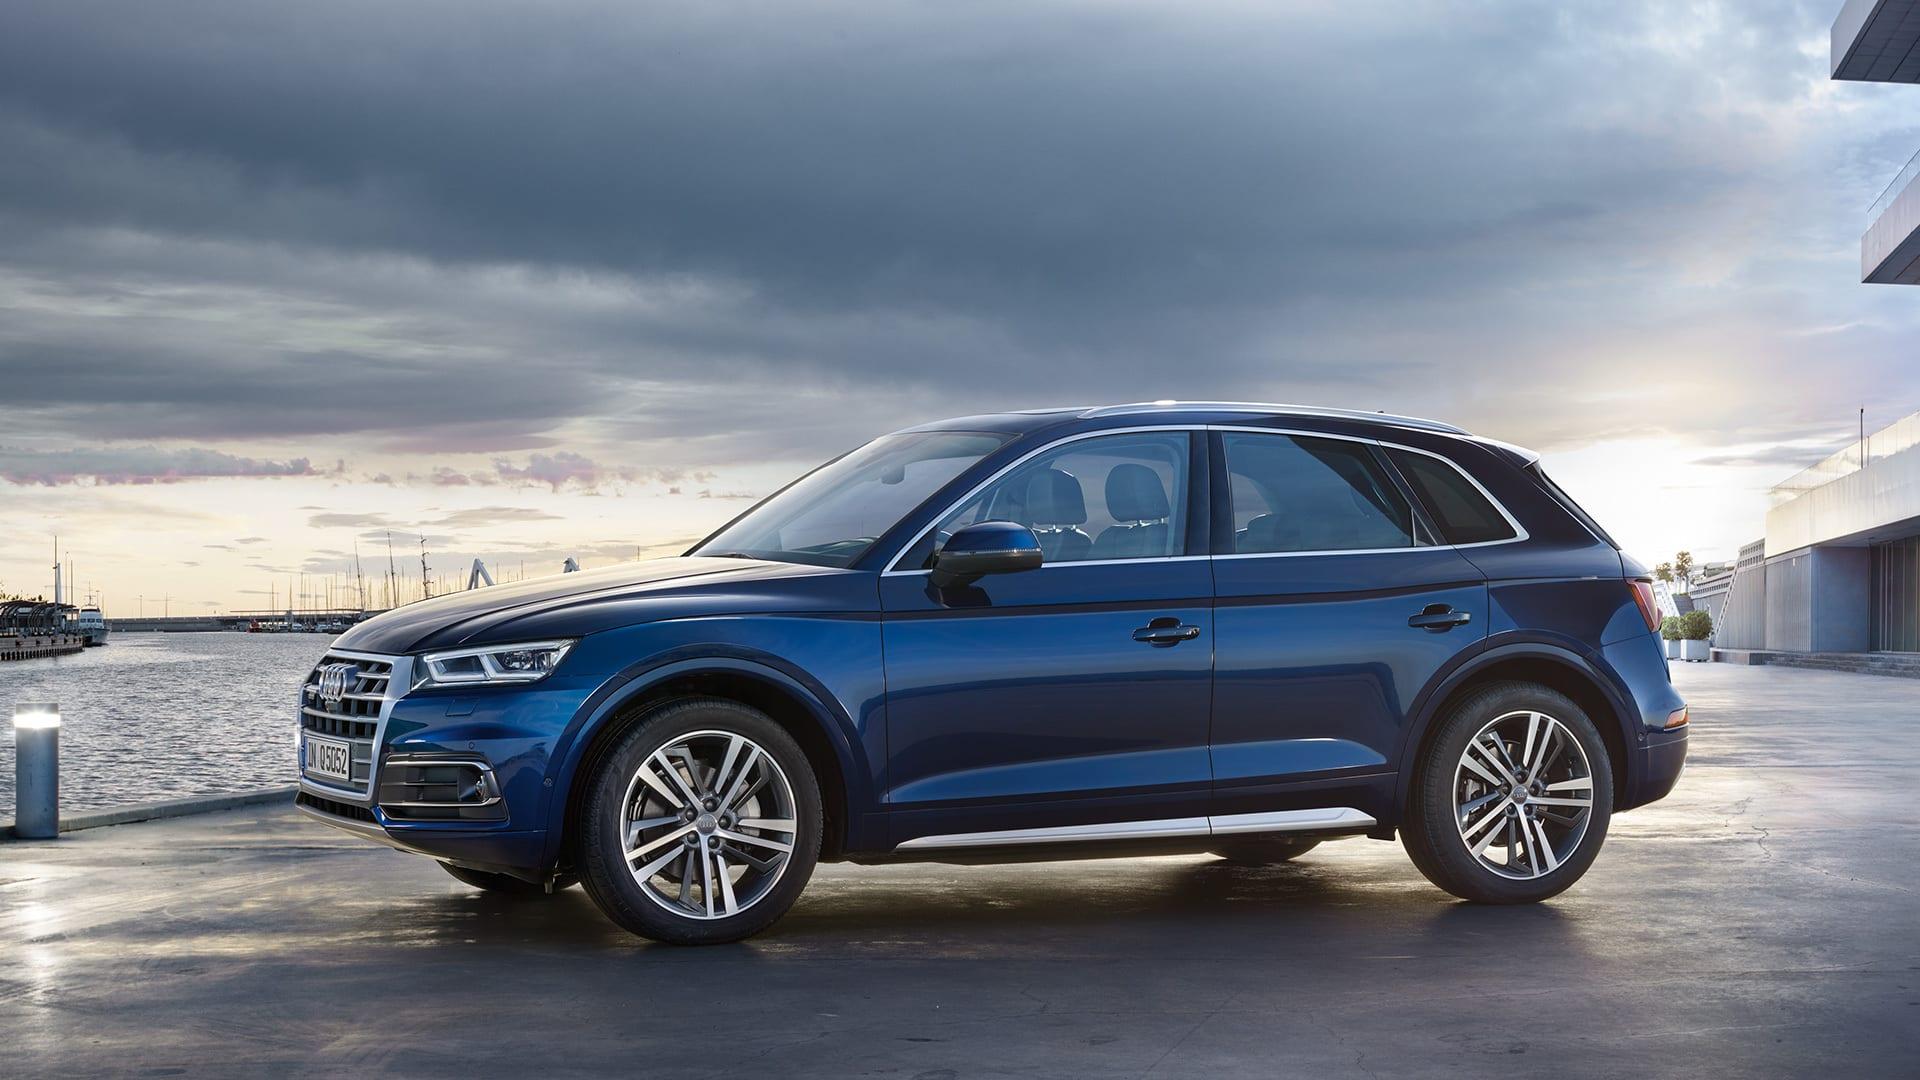 Kelebihan Kekurangan Audi Q5 Murah Berkualitas